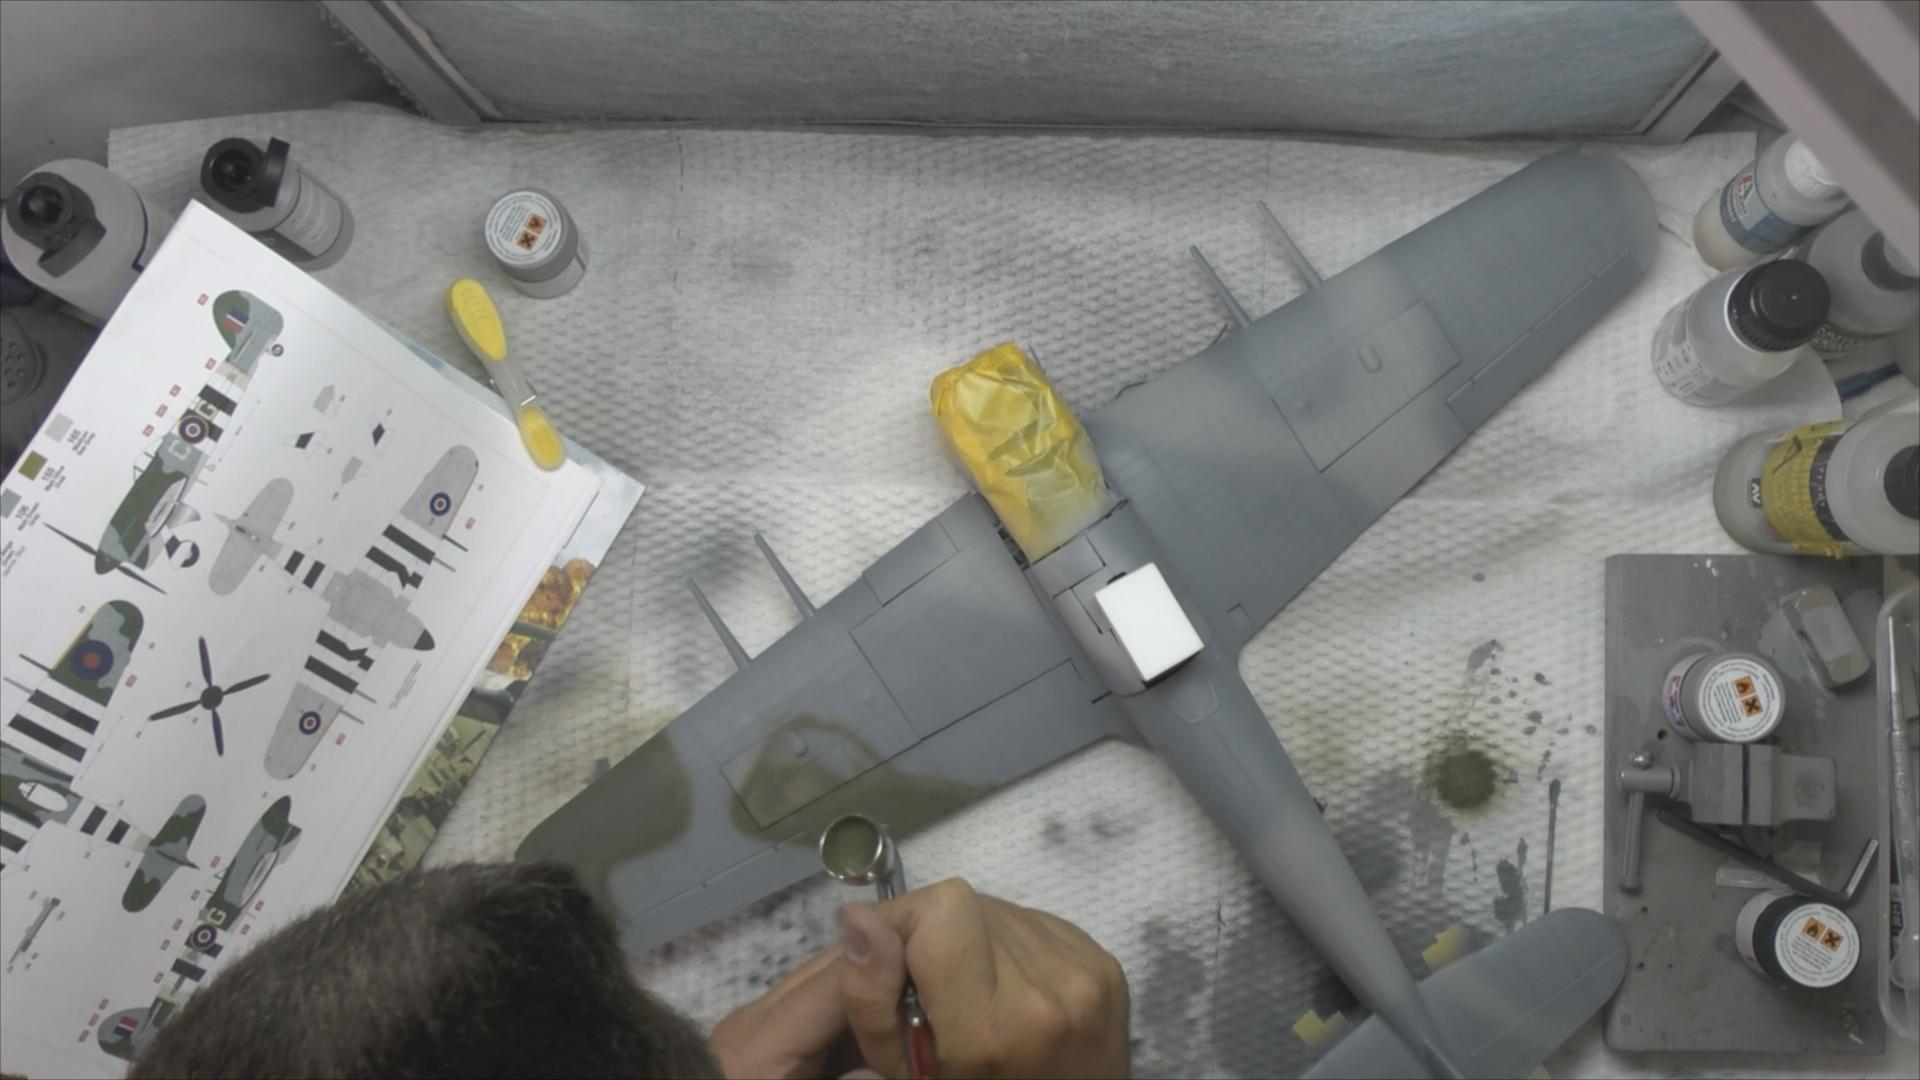 Hawker+Typhoon+Part+8+Pic+2.jpg